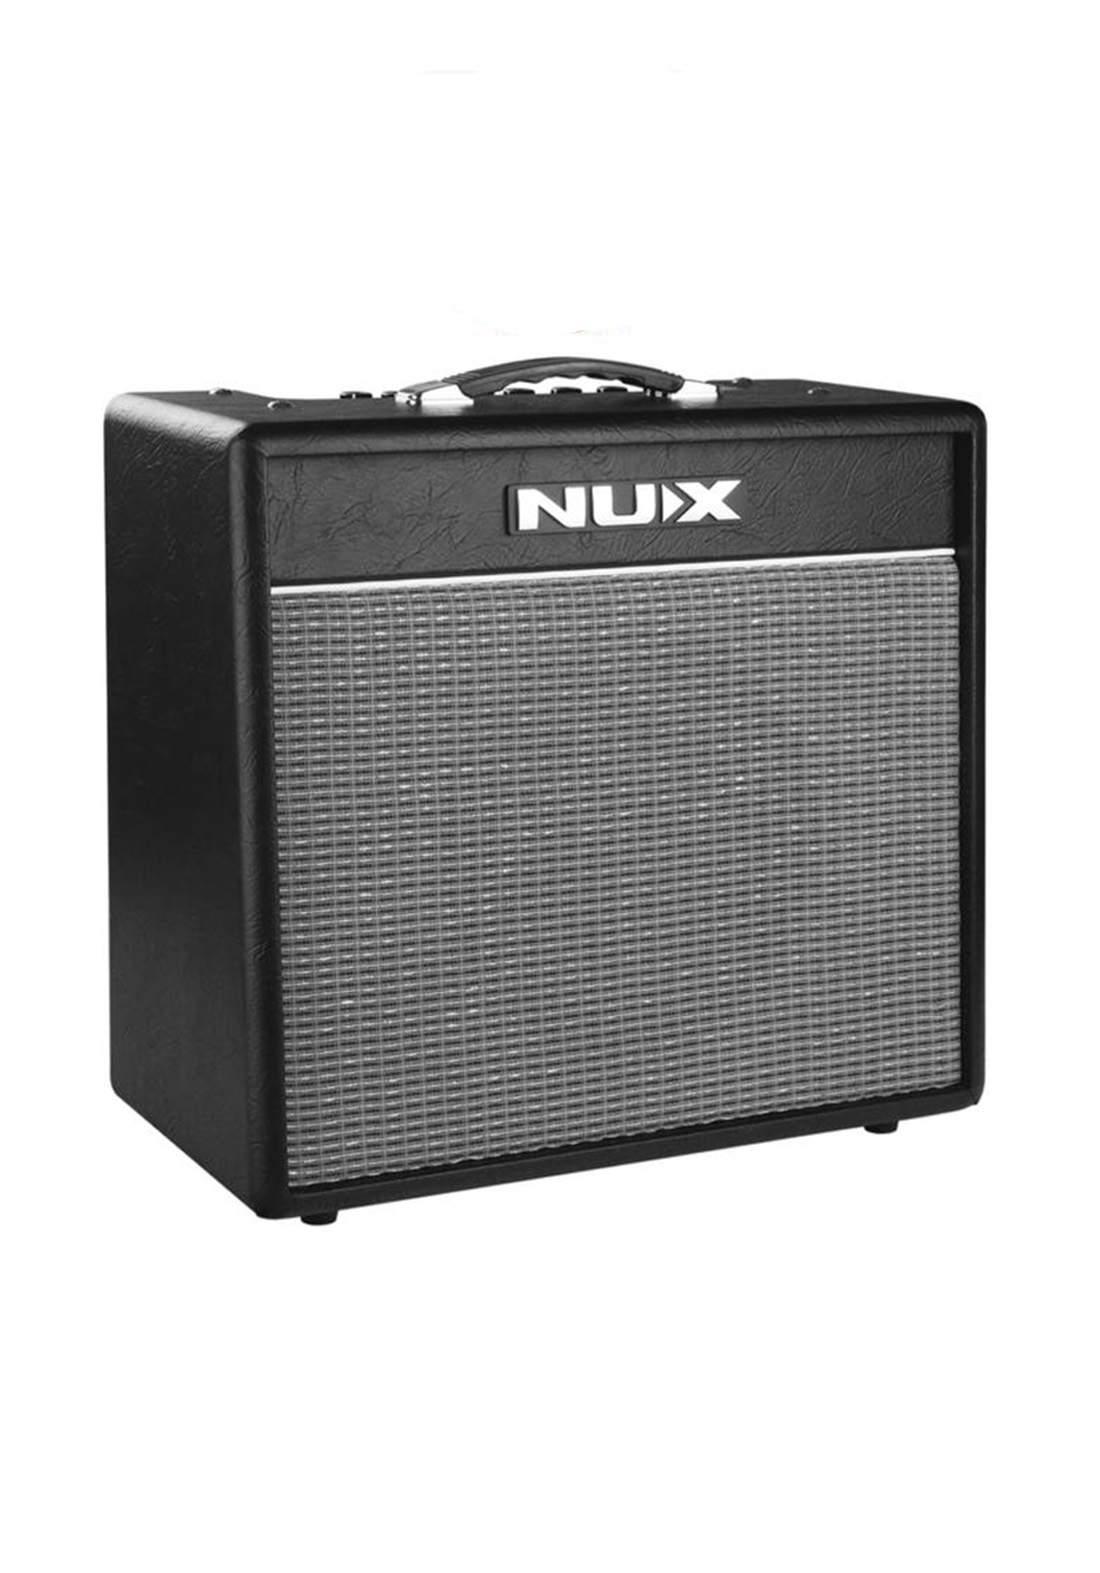 Nux Guitar Amplifier Mighty 40 Bt Series -امبليفاير جيتار